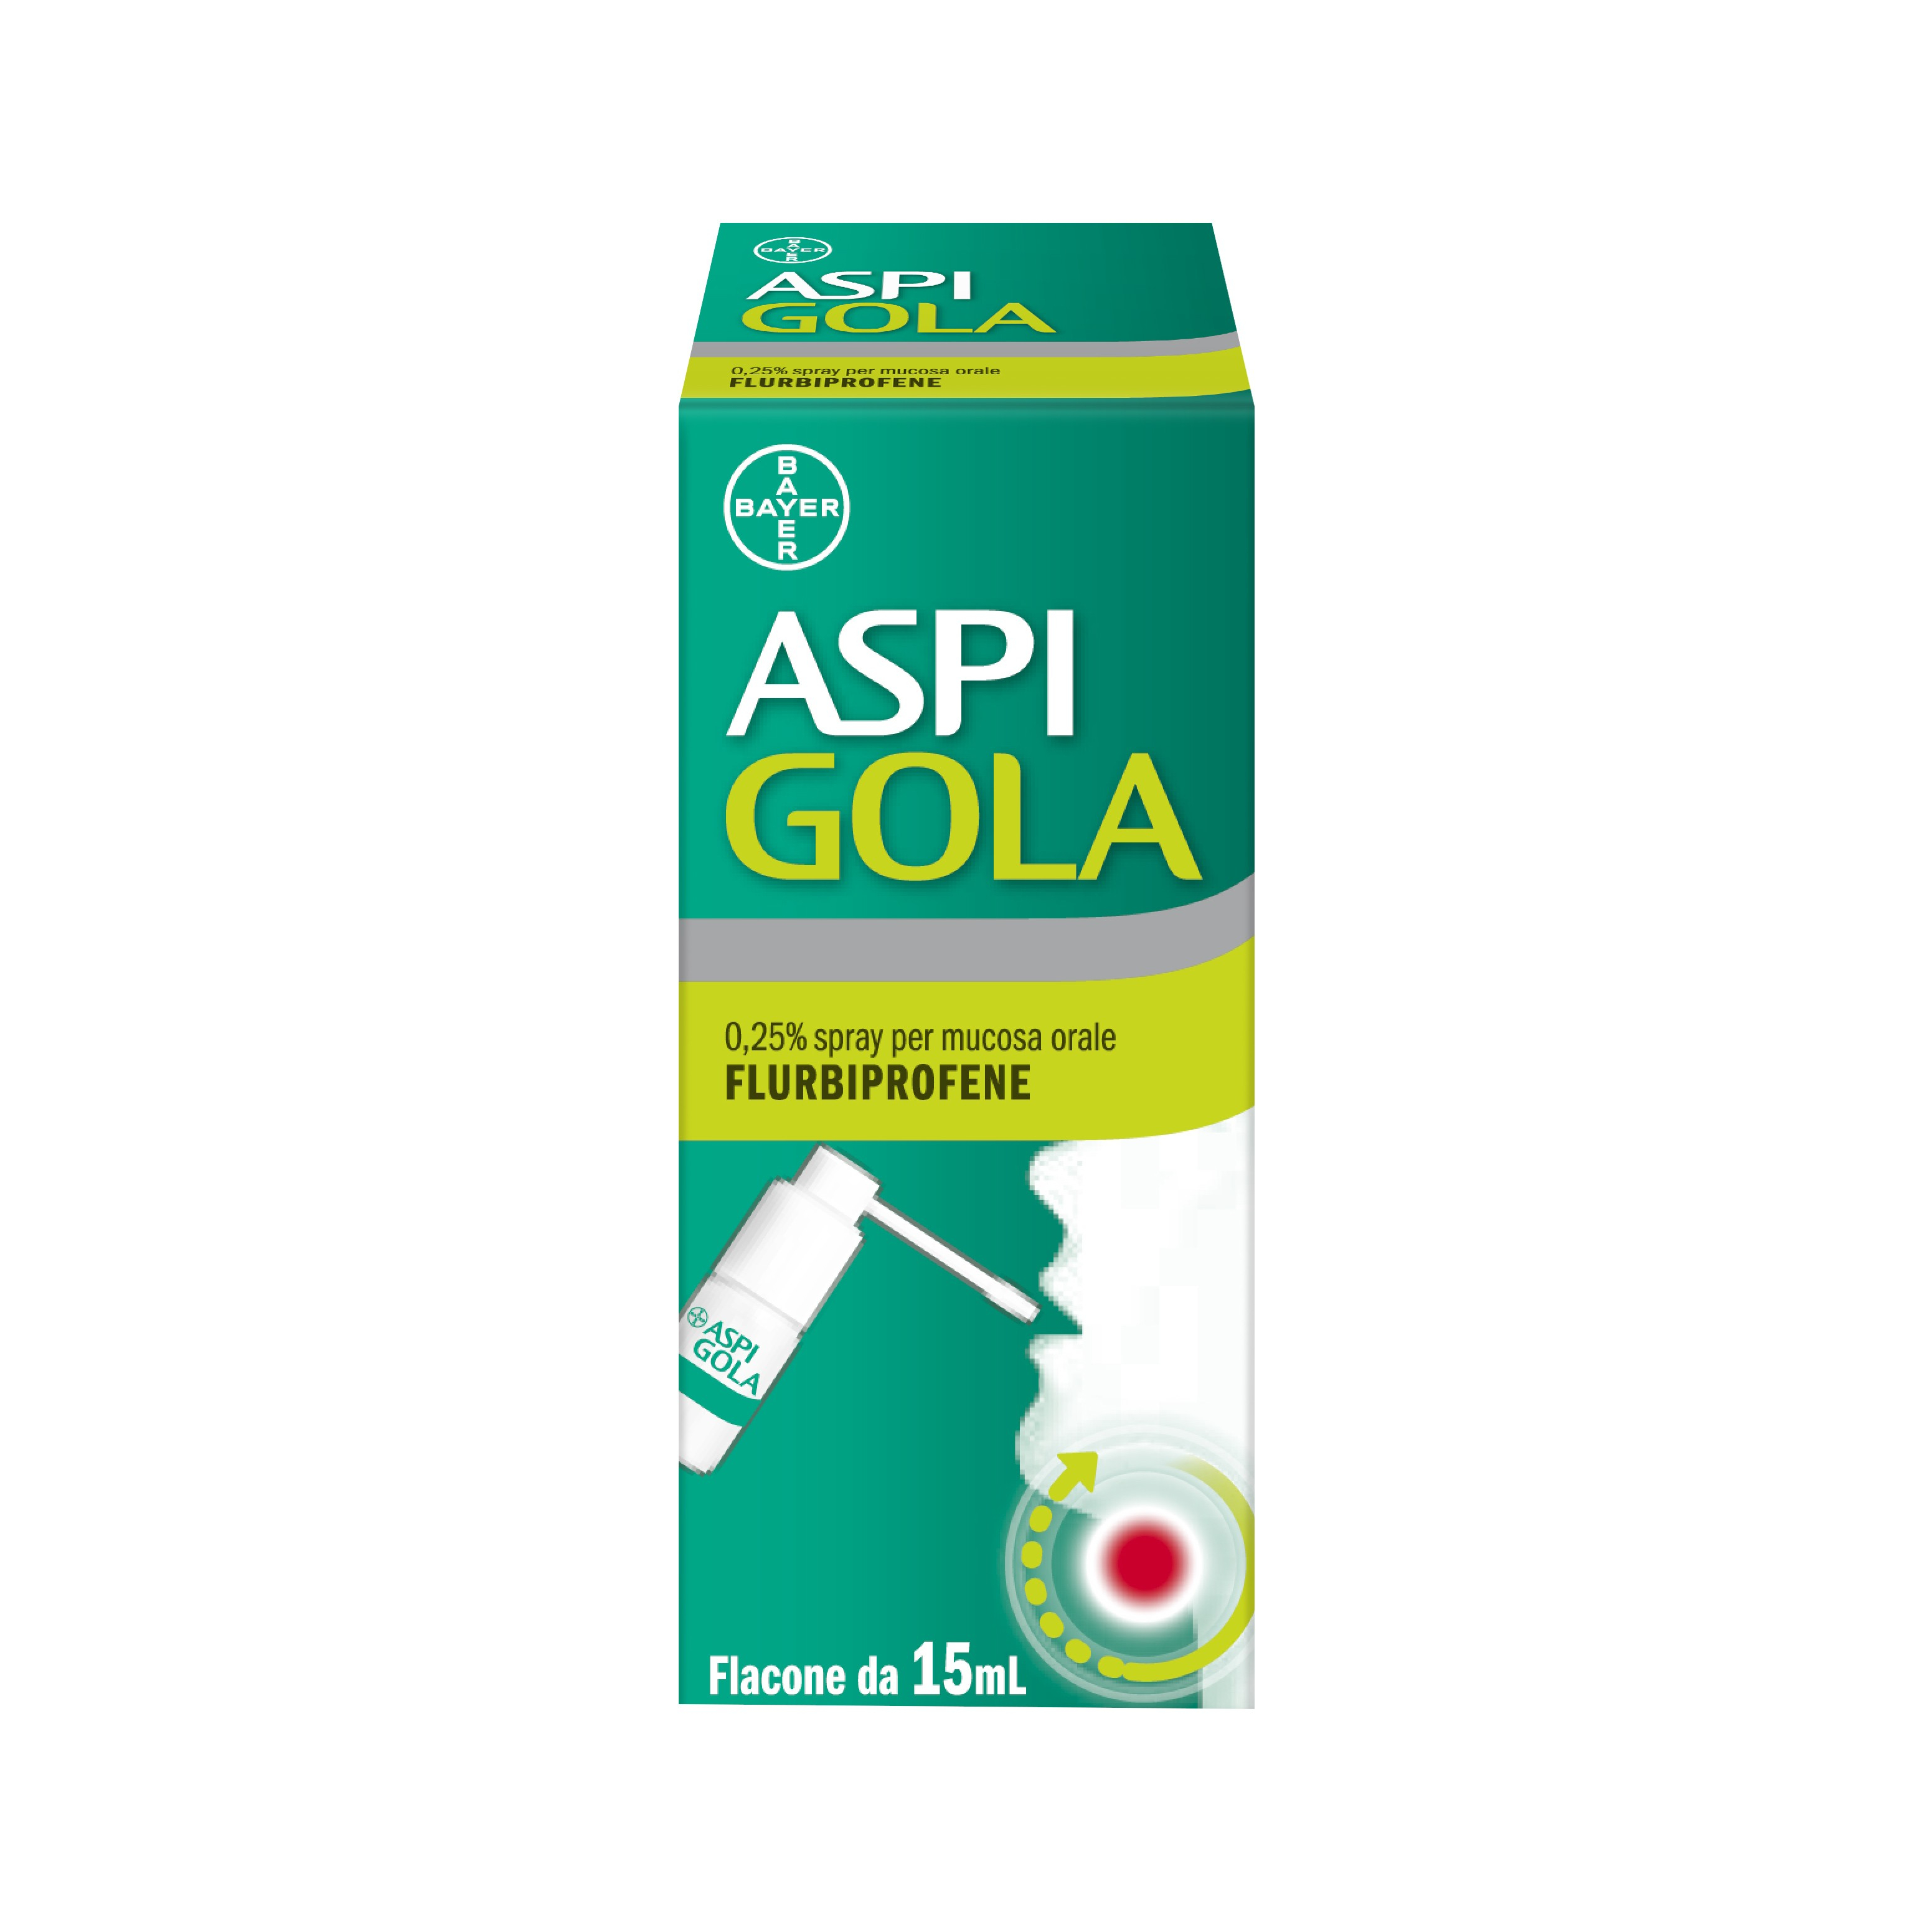 Aspi Gola Spray Flurbiprofene Mucosa Orale-Formato 15 ml.